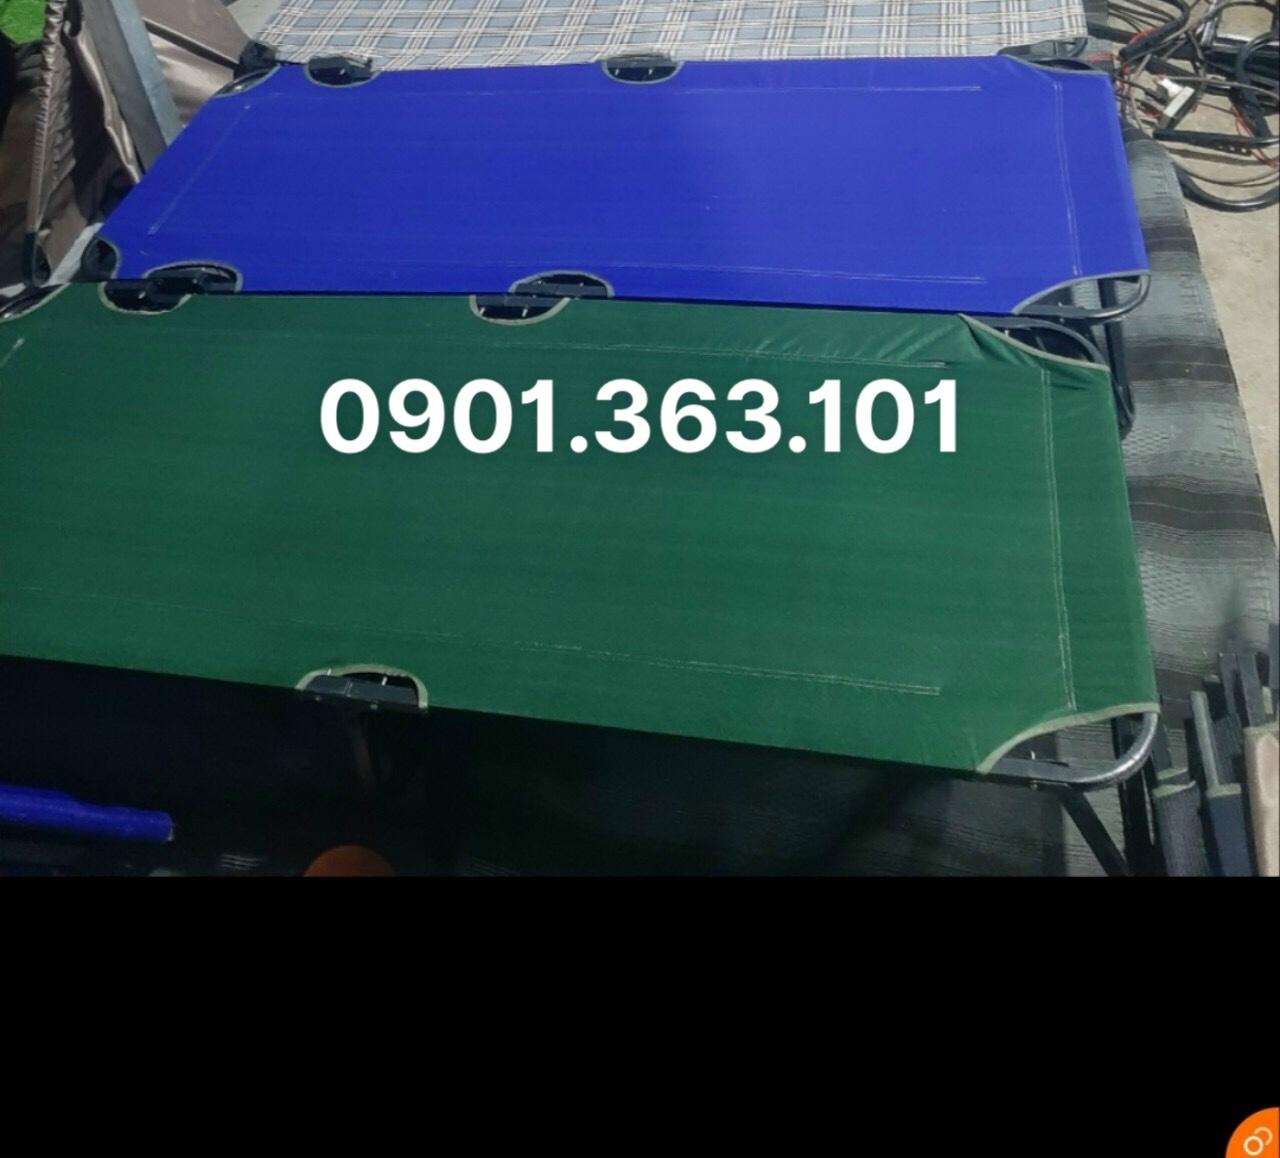 Z2640751722645 4839c6ae2d48359c7affadc14ea5ac24